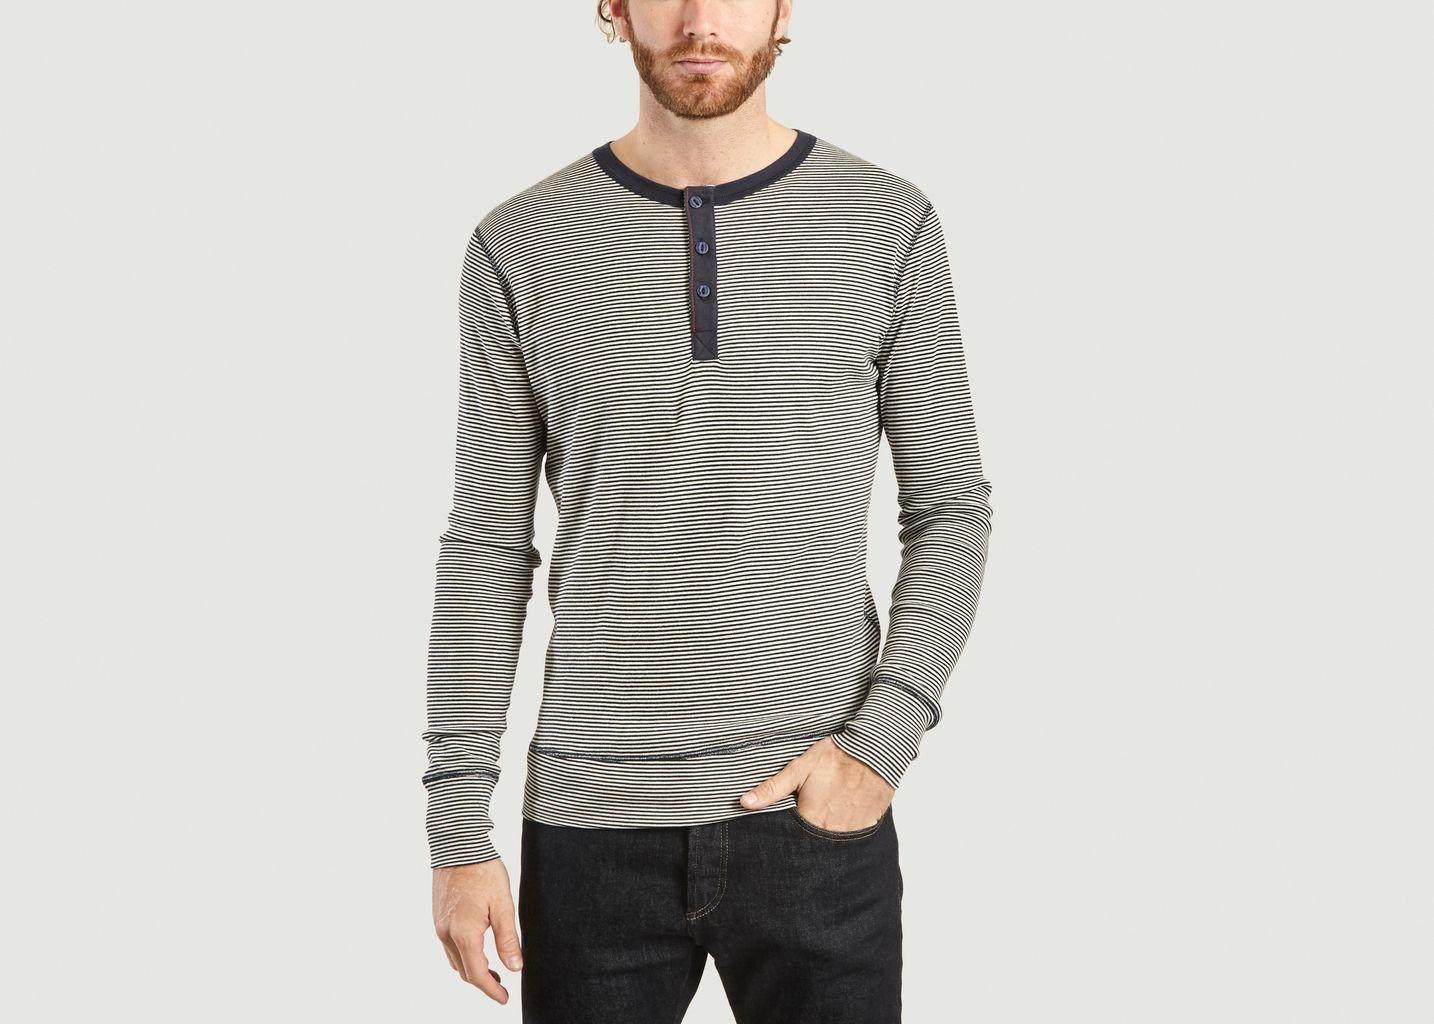 T-Shirt Manches Longues Henley Rayé Harri - Hemen